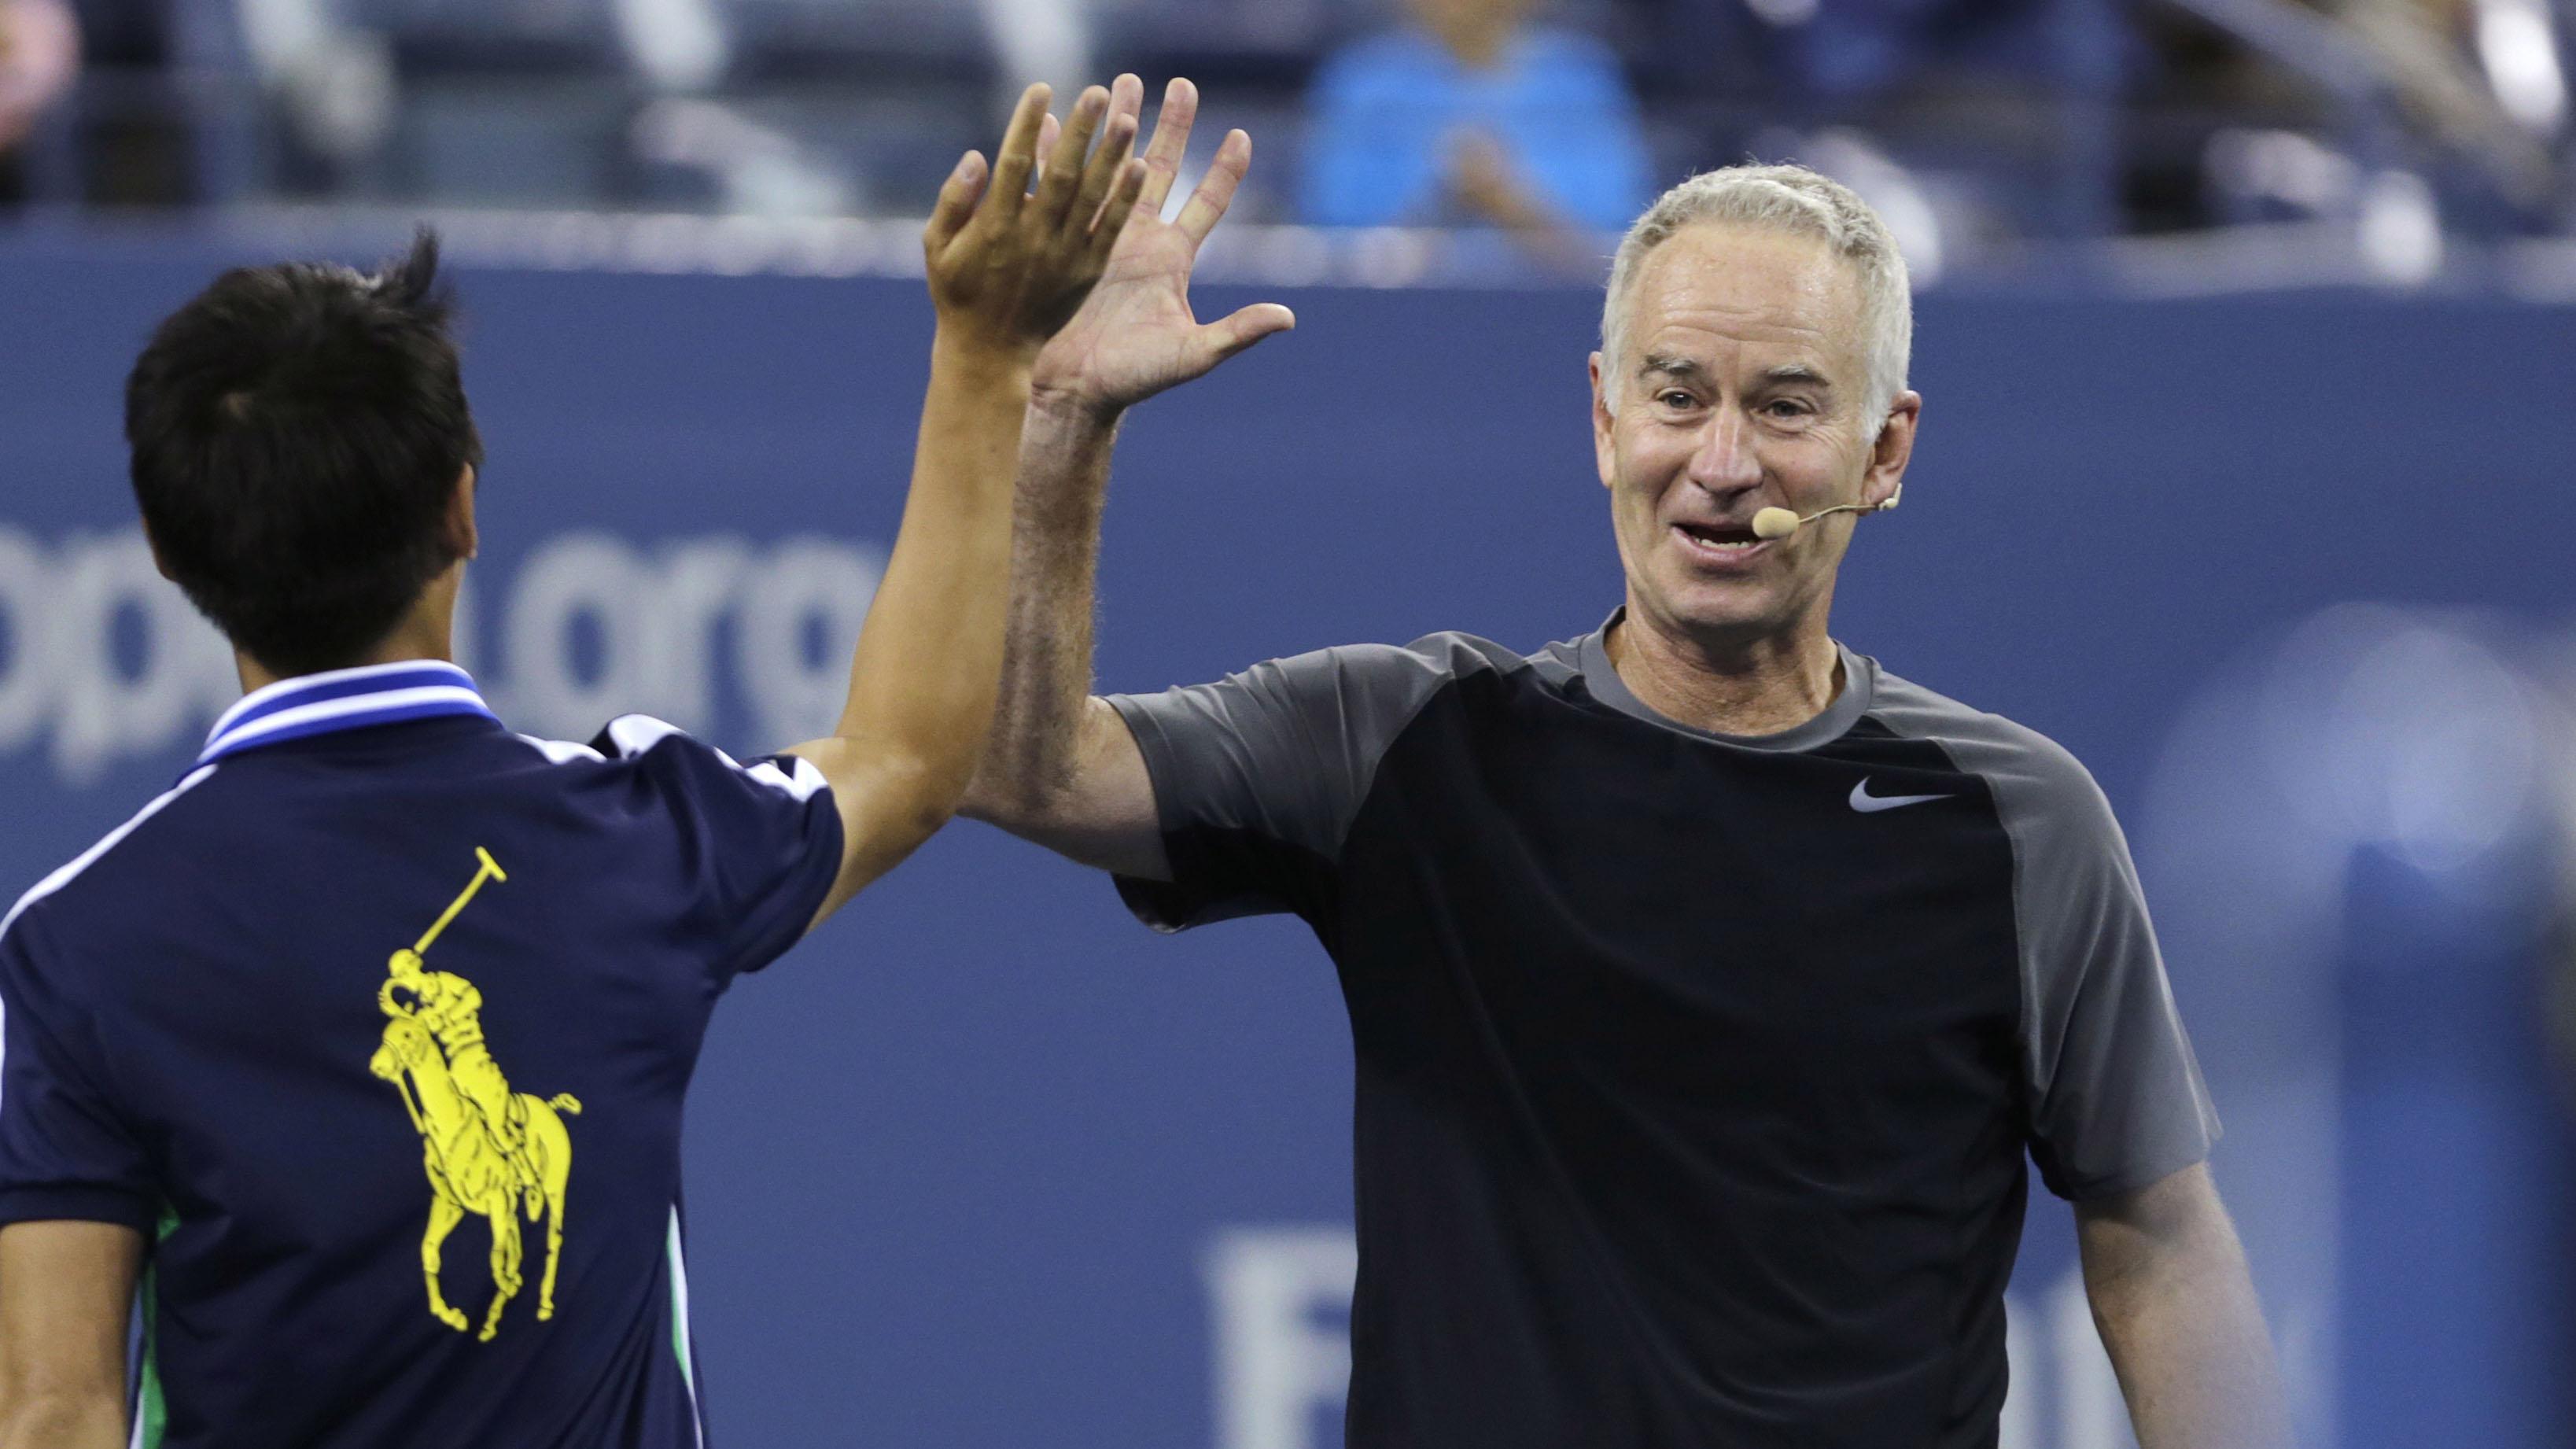 Serena Williams John McEnroe believes he could still take her